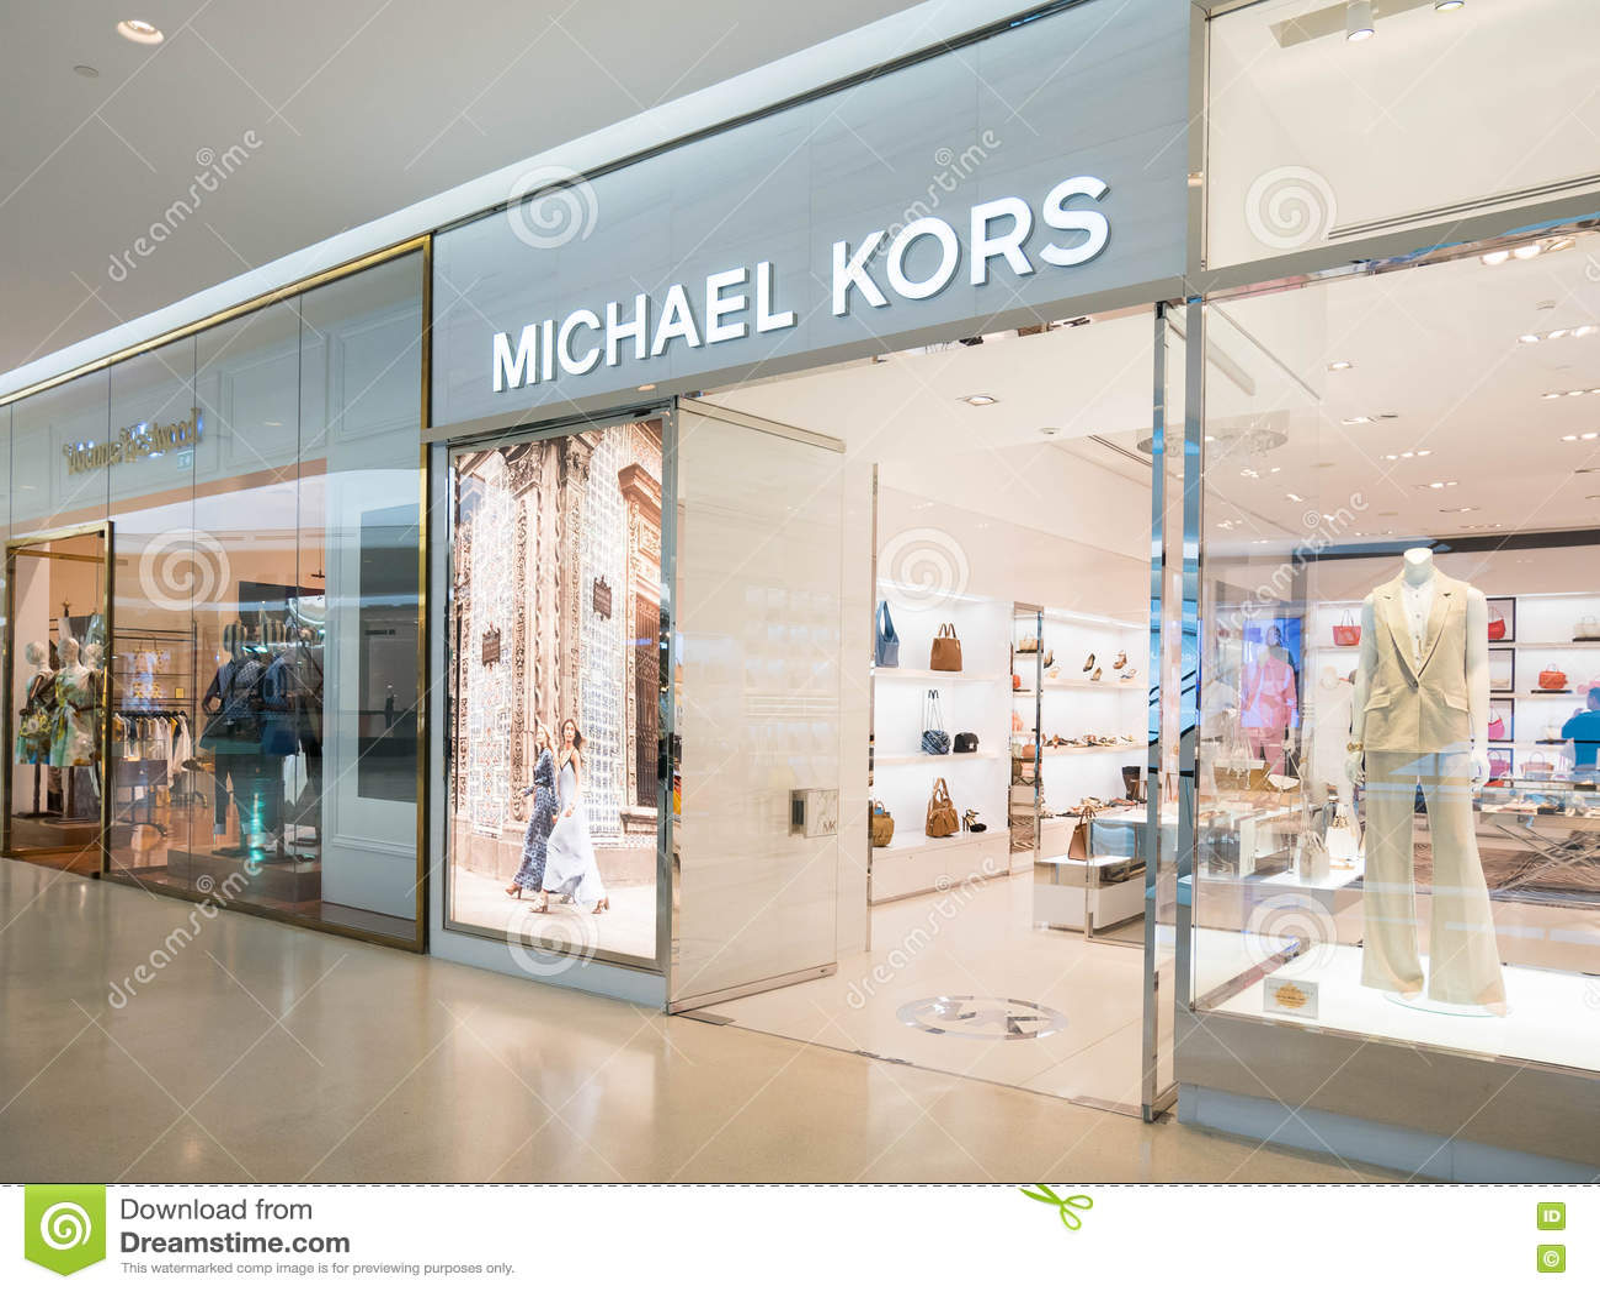 e870f0daa9f04 Loja De Michael Kors No Shopping Central Da Embaixada Do Centro ...